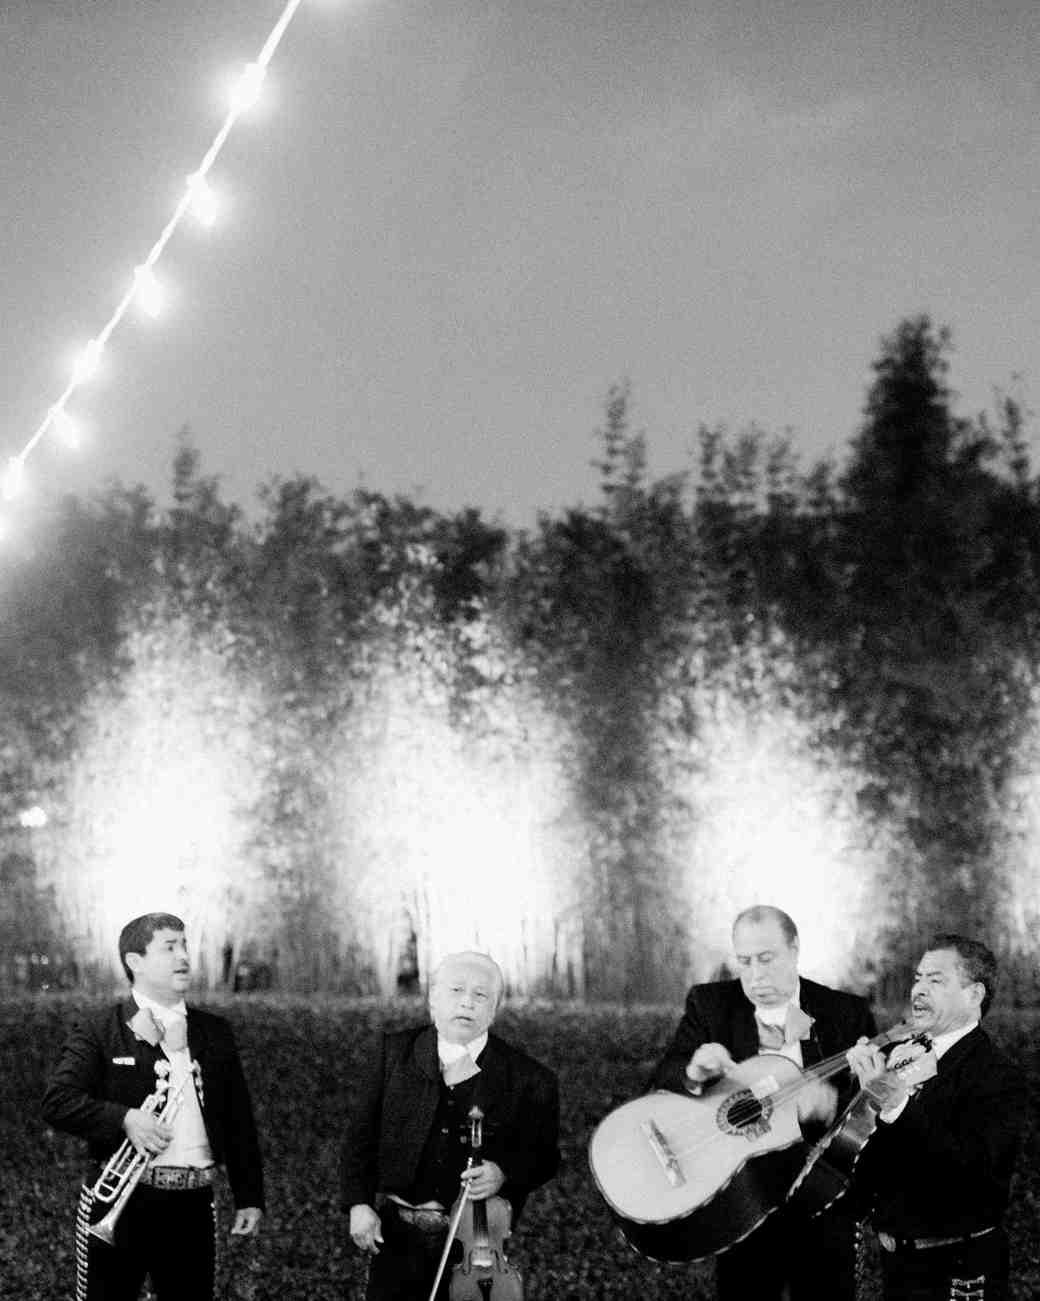 atalia-raul-wedding-music-80-s112395-1215.jpg